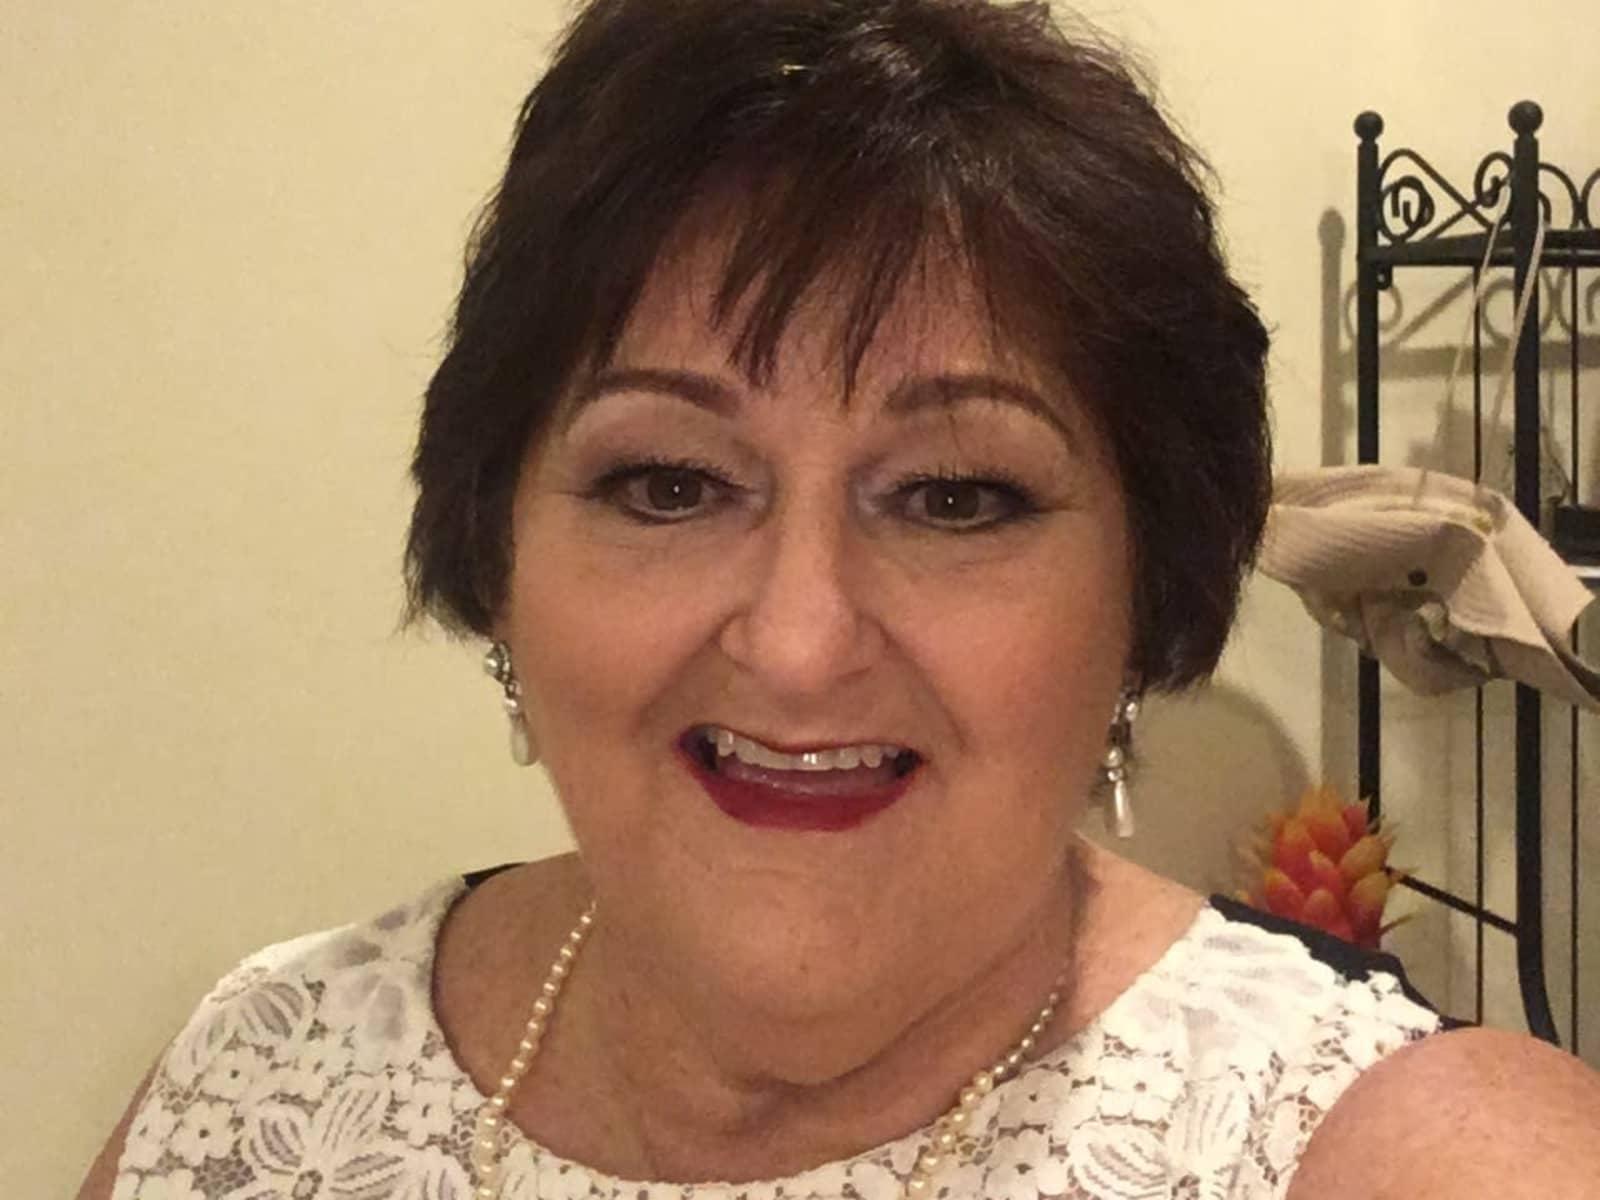 Cynthia from Doha, Qatar